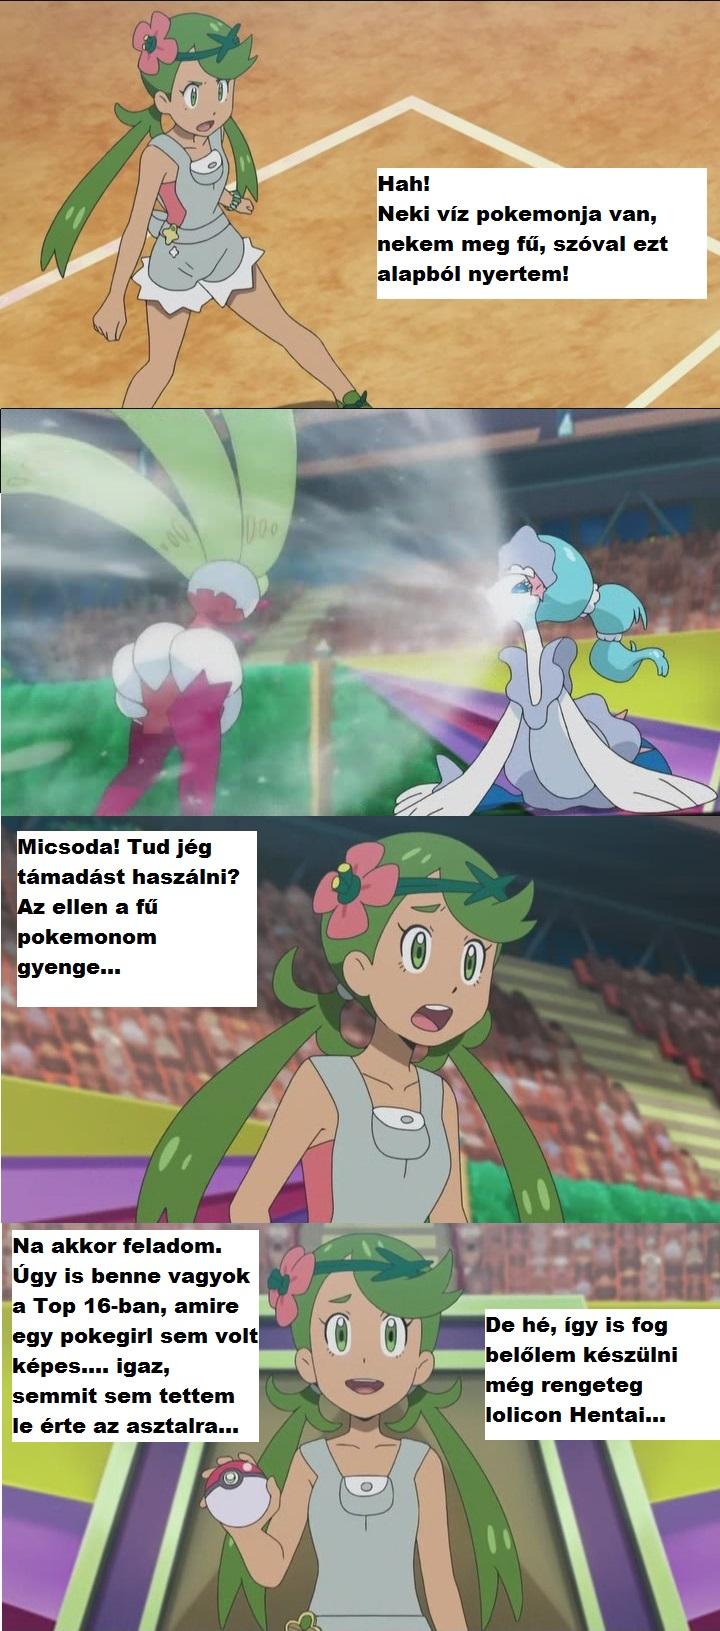 watch_pokemon_sun_moon_episode_130_english_subbedat_gogoan_0006.jpg